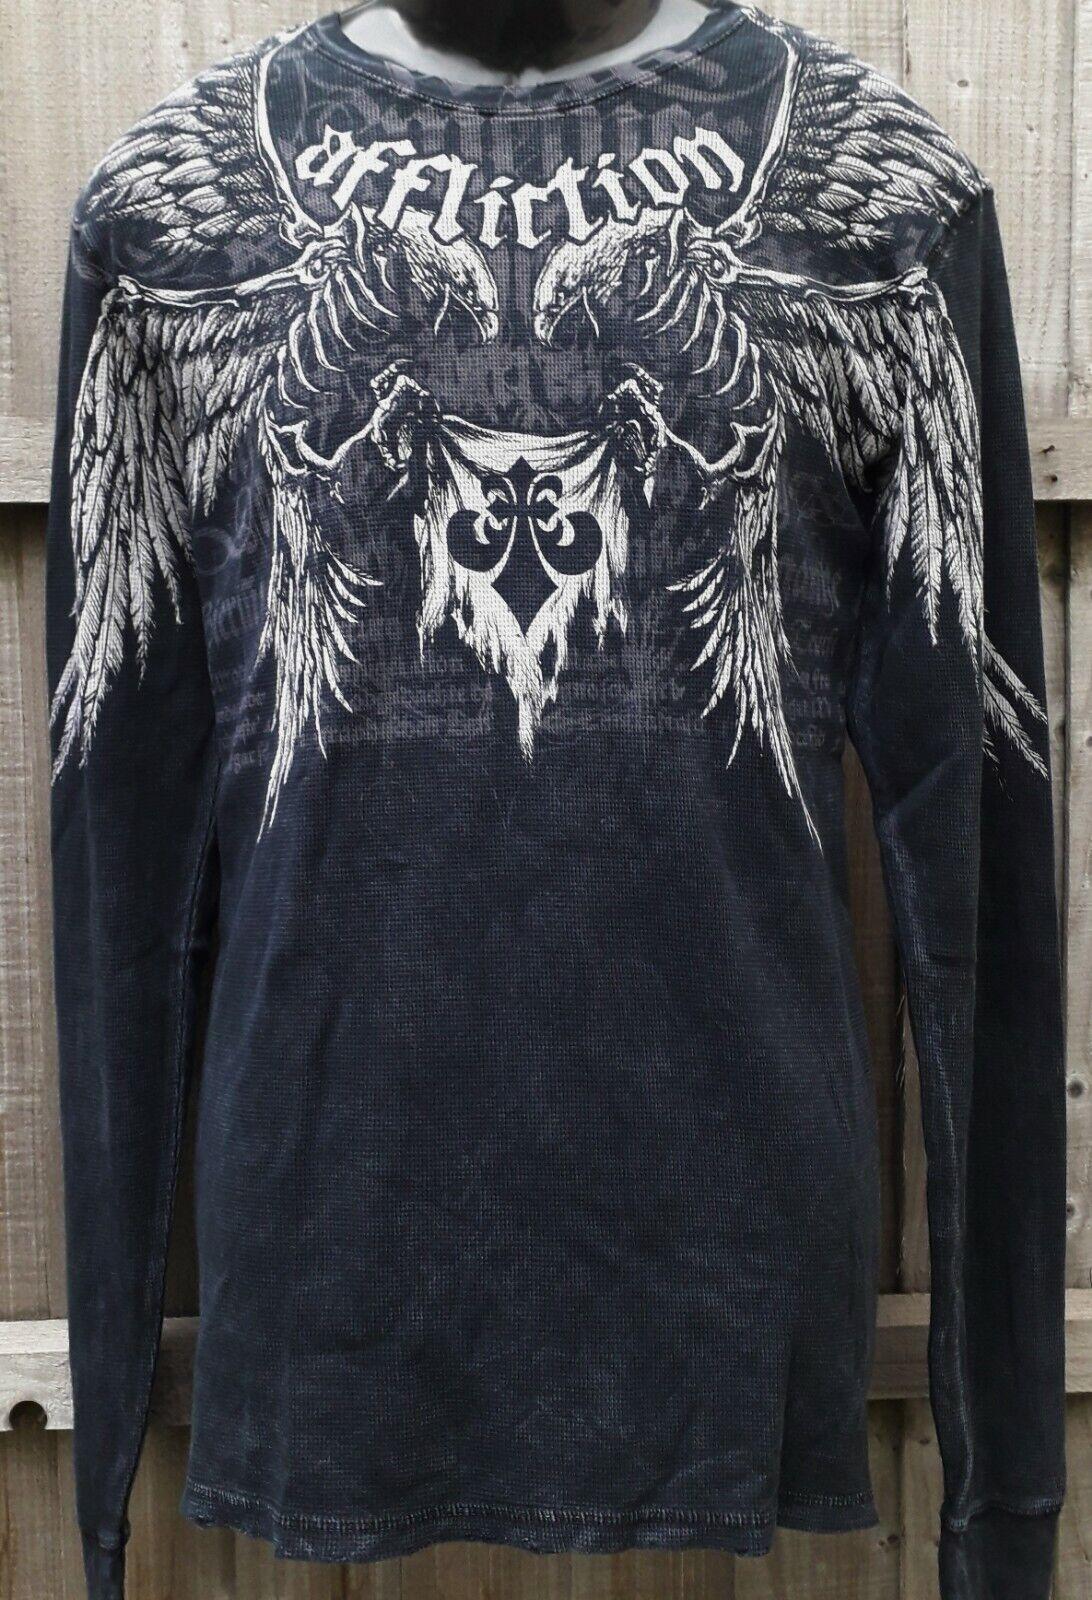 AFFLICTION BIRDS OF PREY XL Medieval Script Skeleton L S T Shirt New UFC Tee